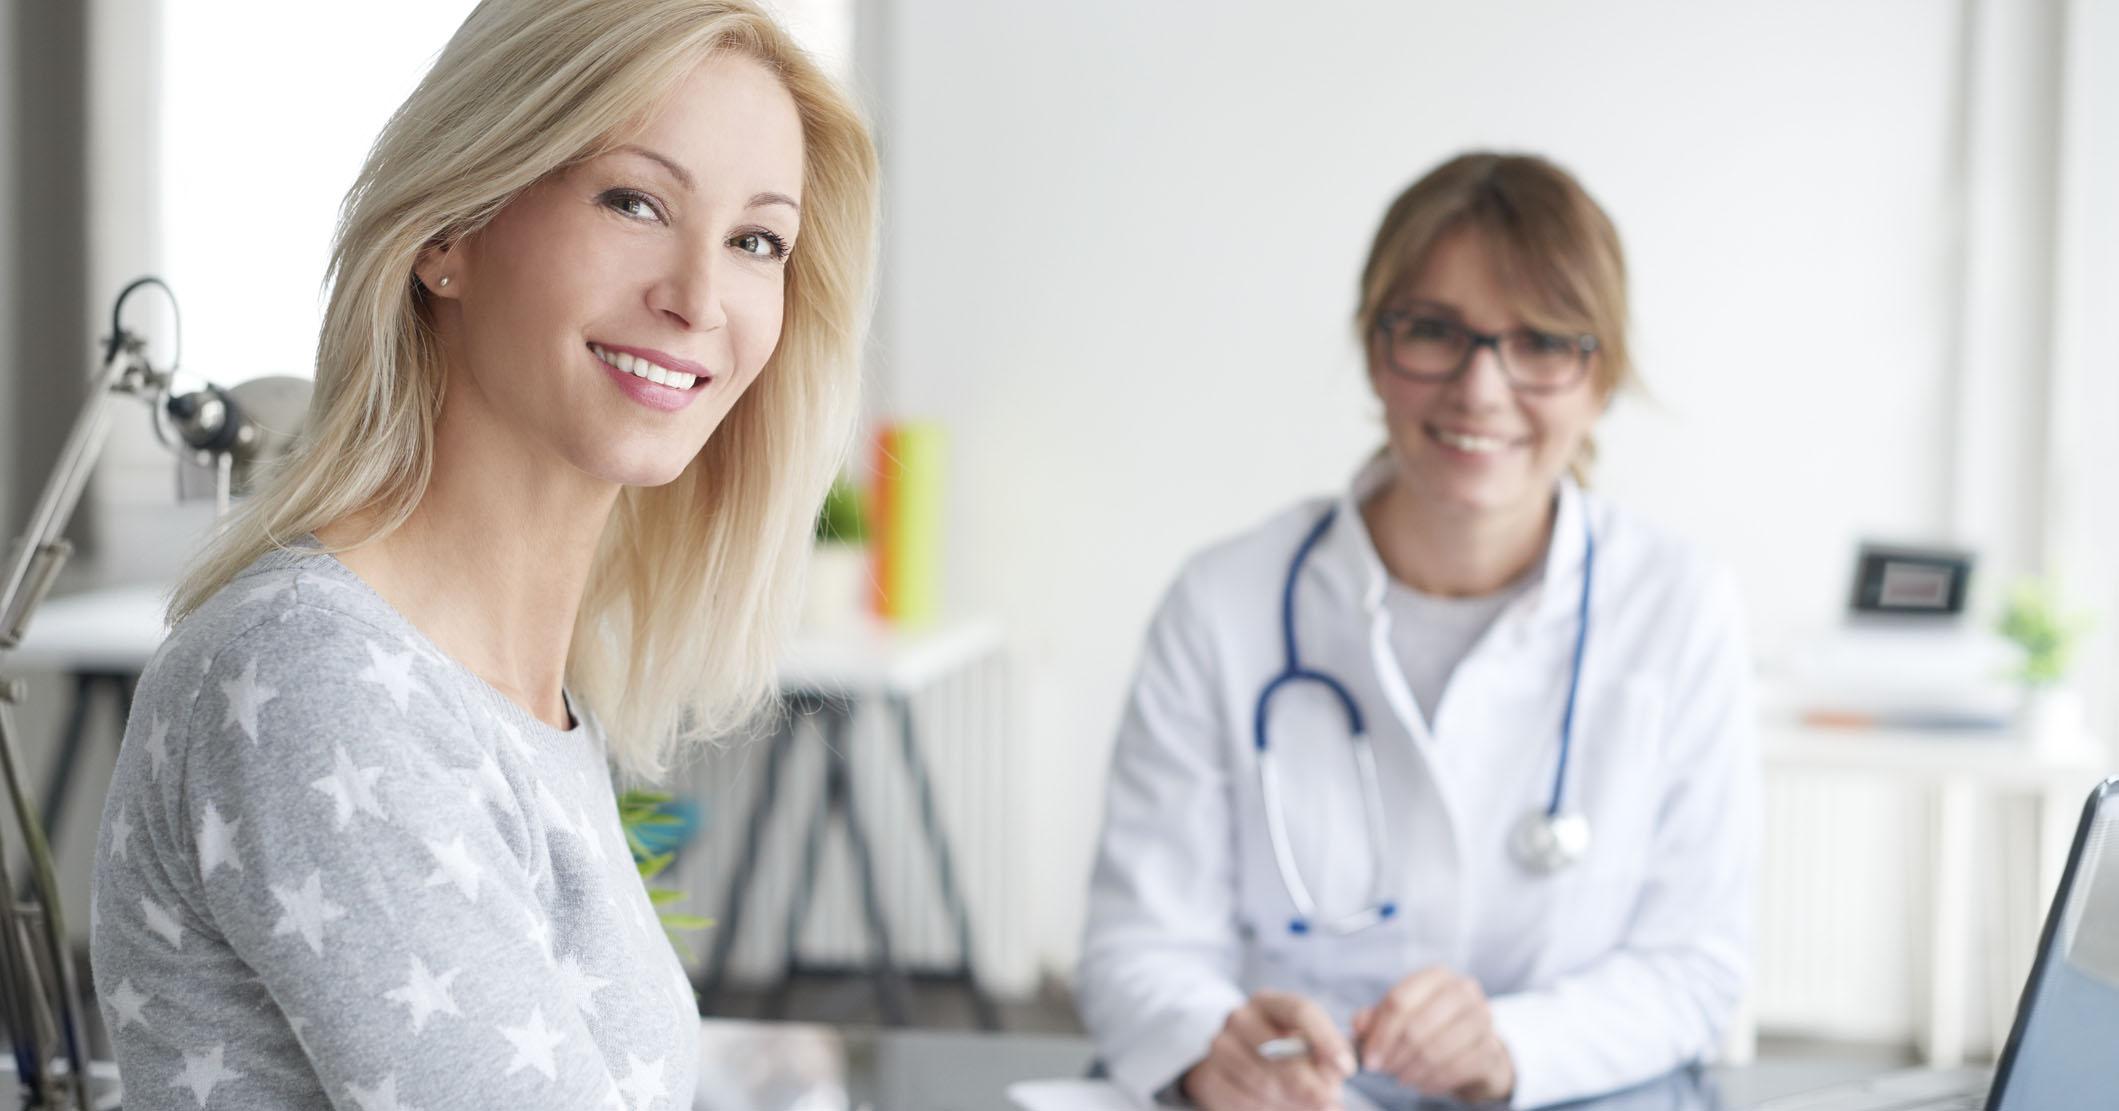 Disease Prevention: Preventative Care with Concierge Care